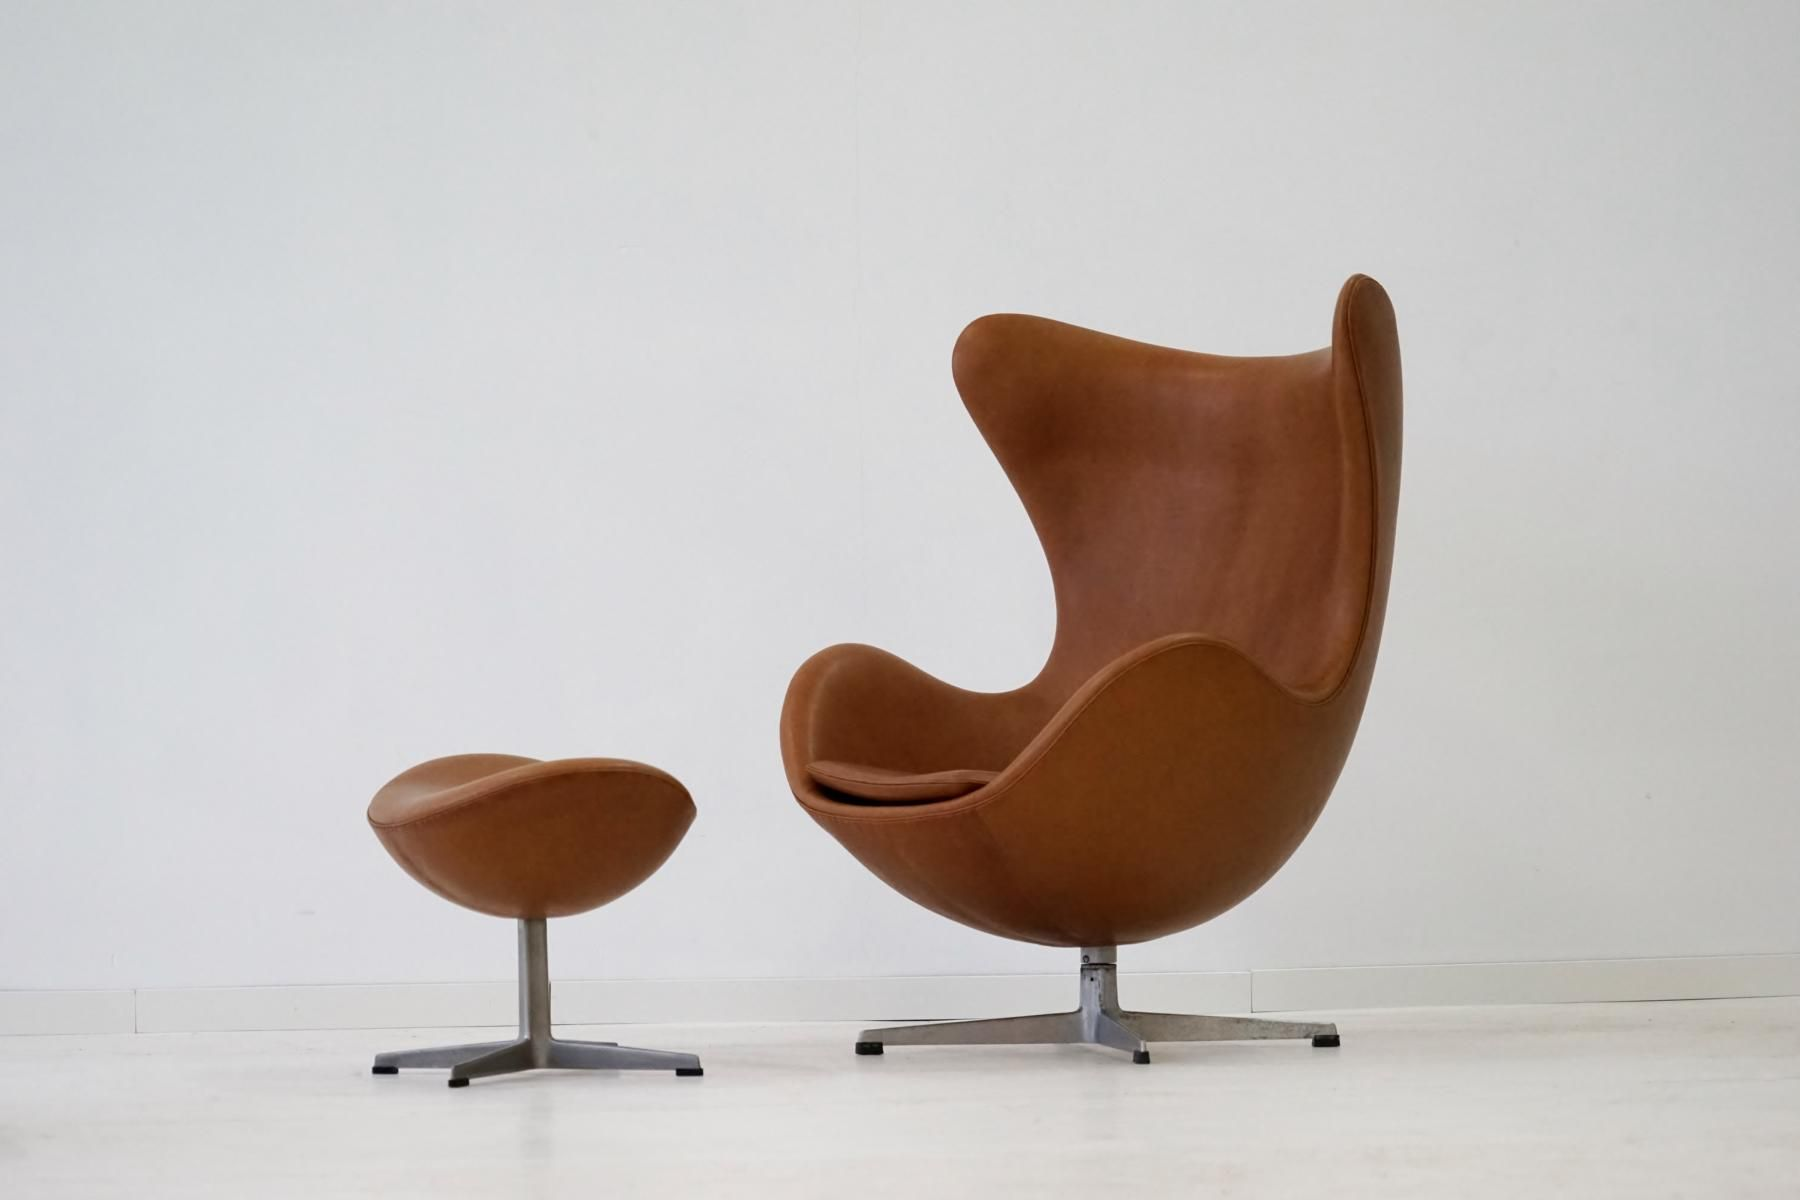 egg sessel ottomane aus leder von arne jacobsen f r fritz hansen 1960er bei pamono kaufen. Black Bedroom Furniture Sets. Home Design Ideas